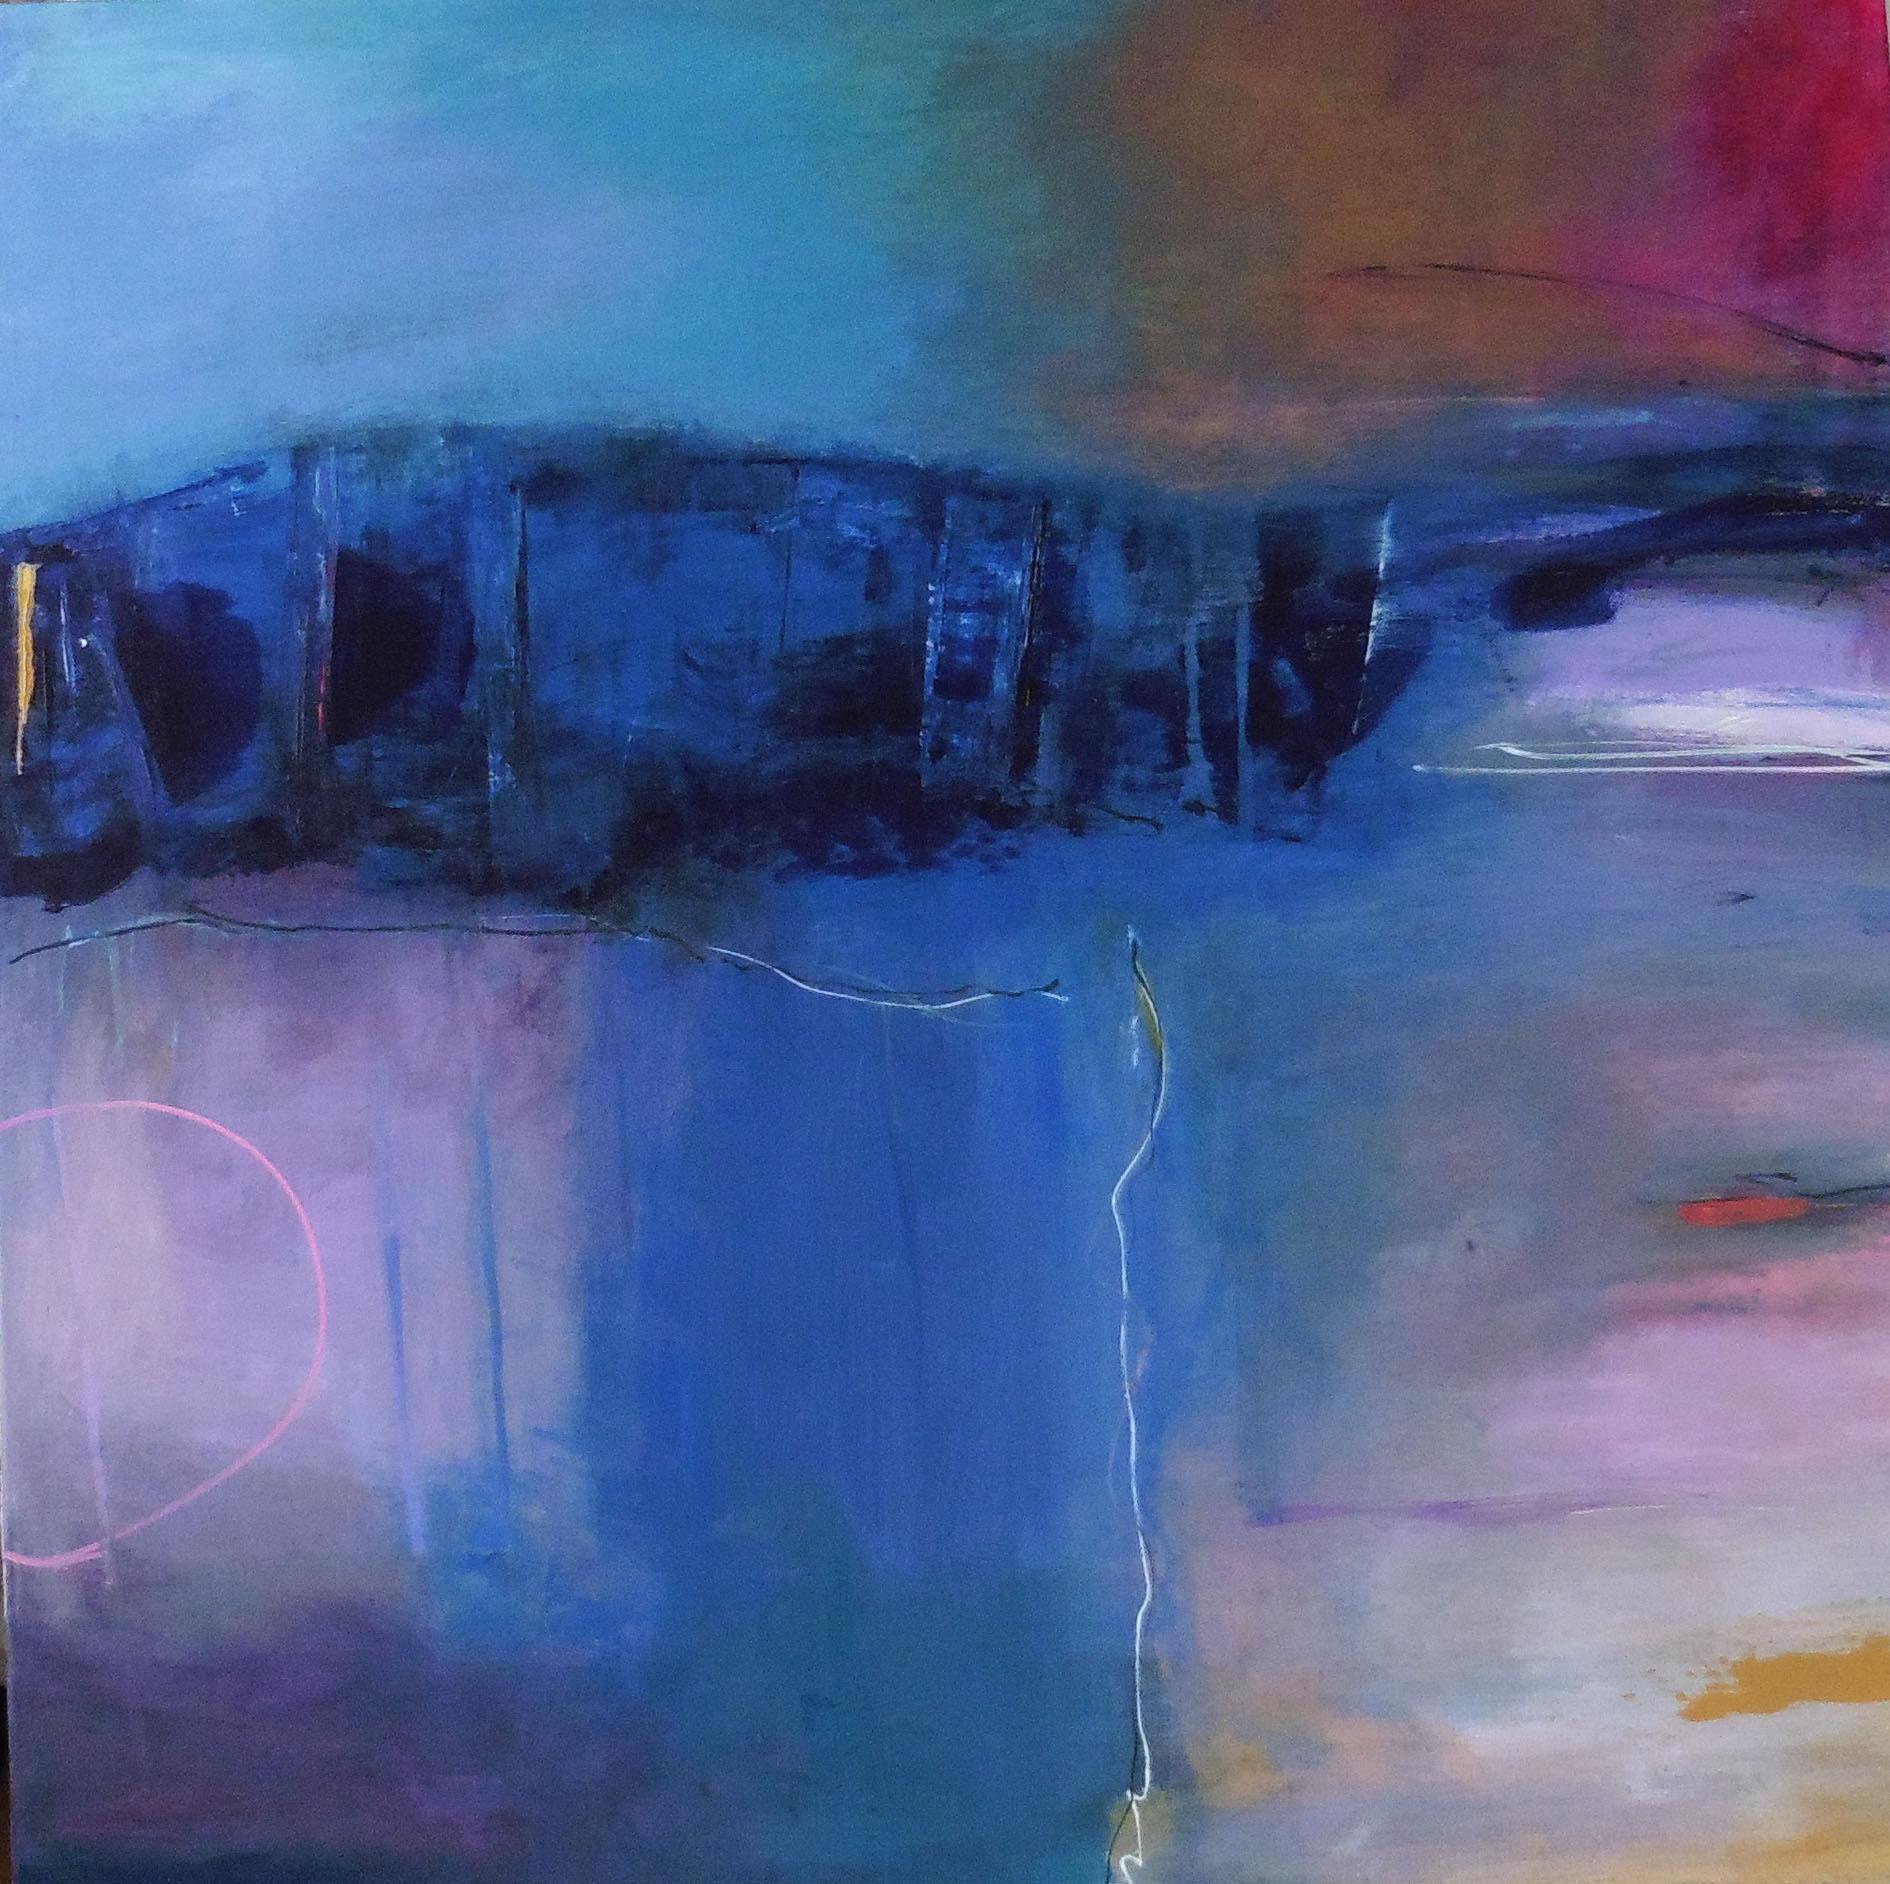 Distance,  Myfanwy Williams, acrylic on canvas